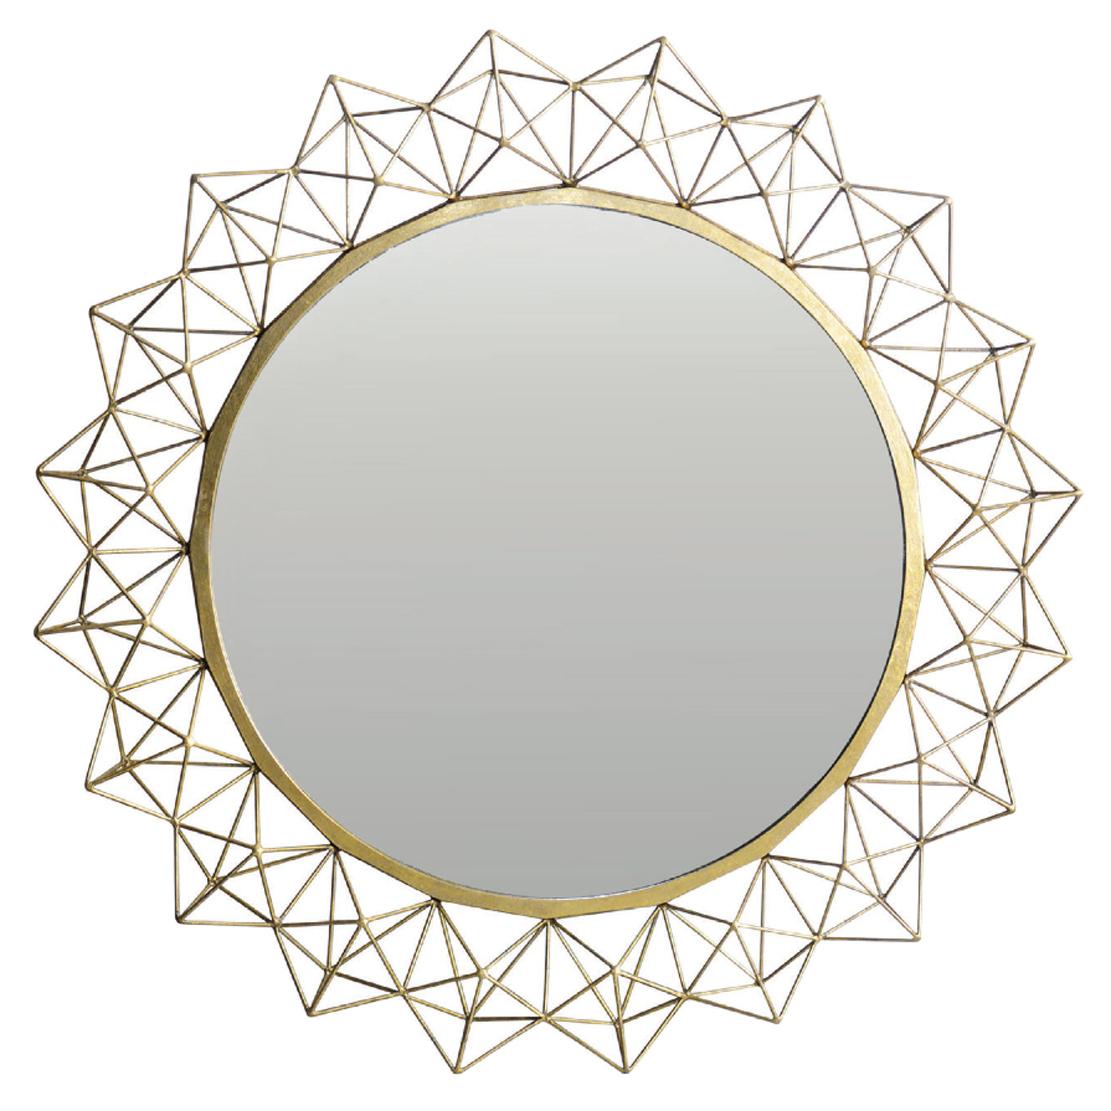 Oly Kaleidoscope Round Large Mirror - 48D